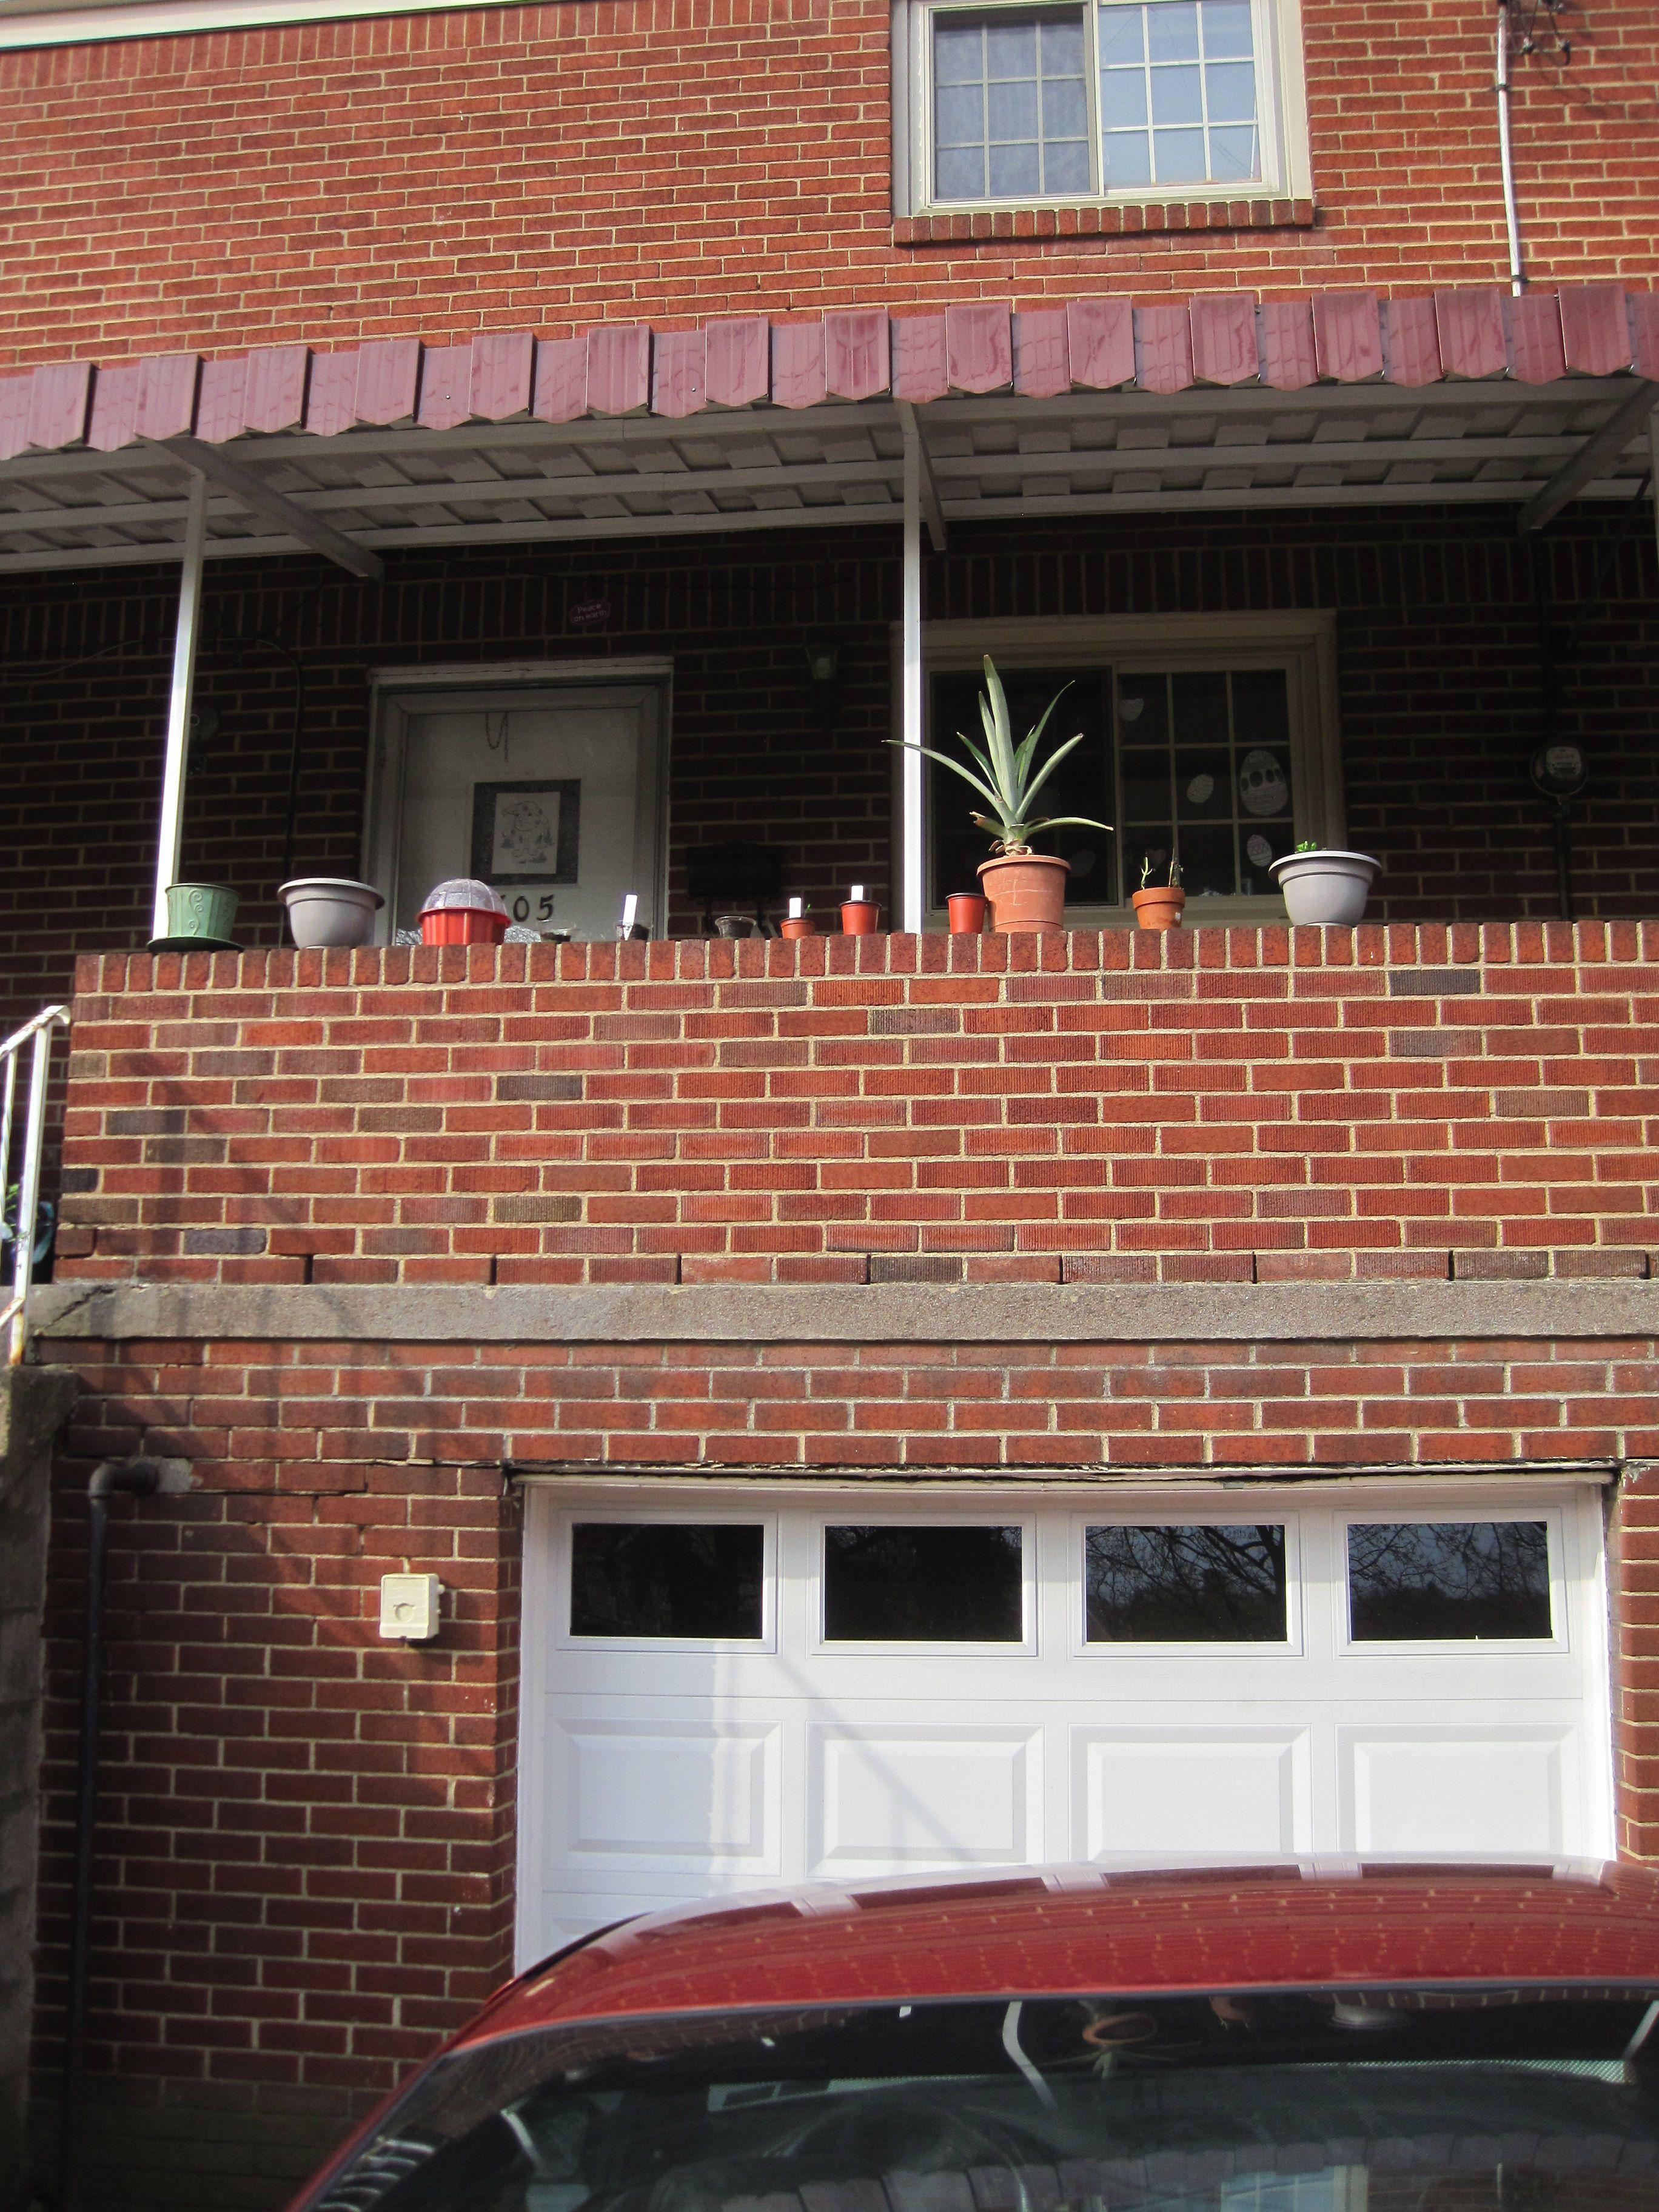 Seedlings growing in pots in a row. Pineapple plant seems happy to ...